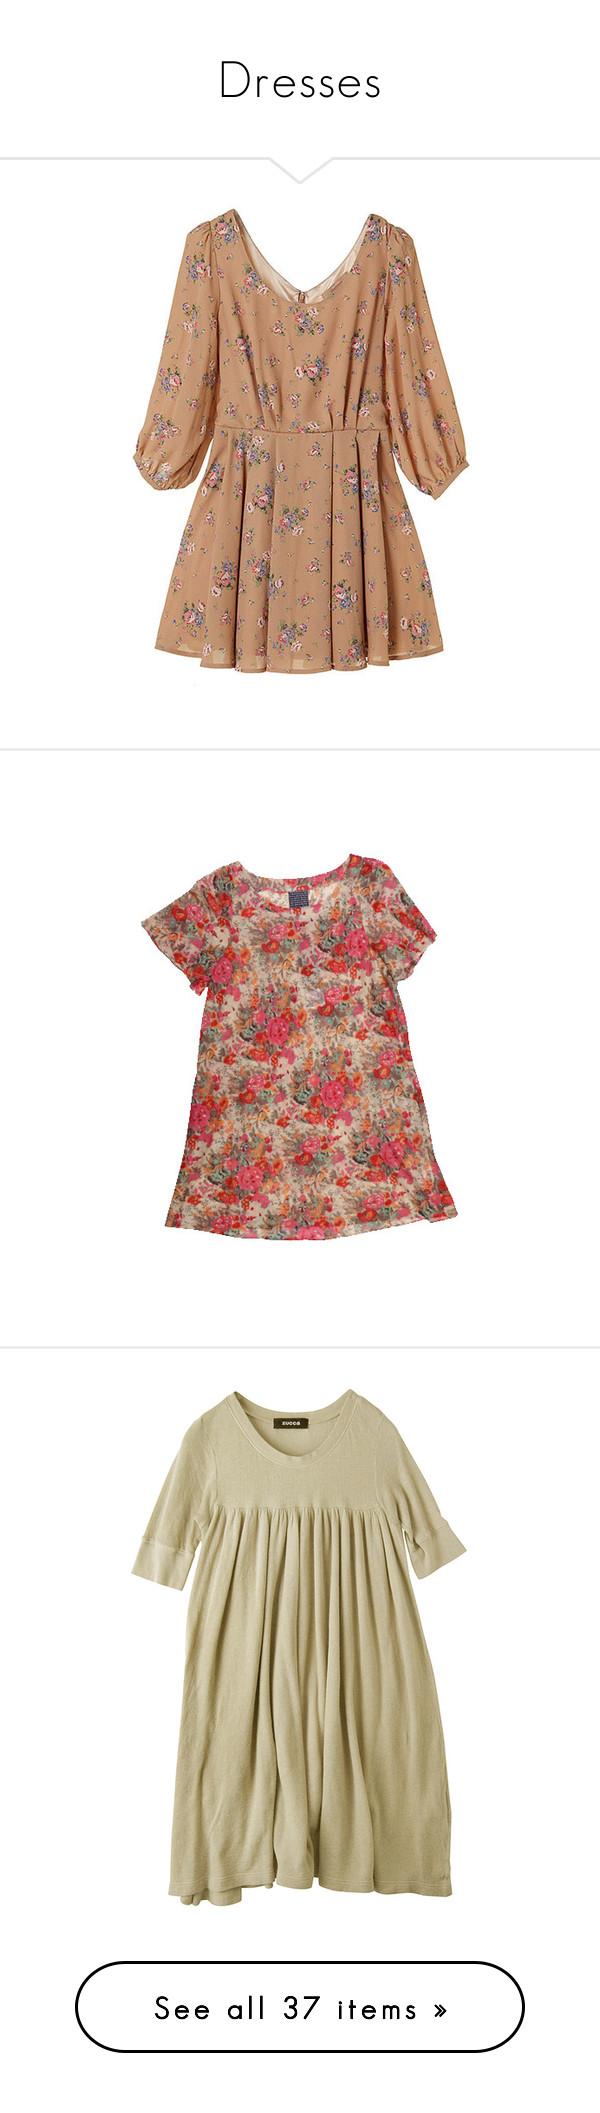 """Dresses"" by jessgrier ❤ liked on Polyvore featuring dresses, vestidos, tops, beige dress, floral, flower pattern dress, floral printed dress, floral pattern dress, flower design dresses and flower print dress"